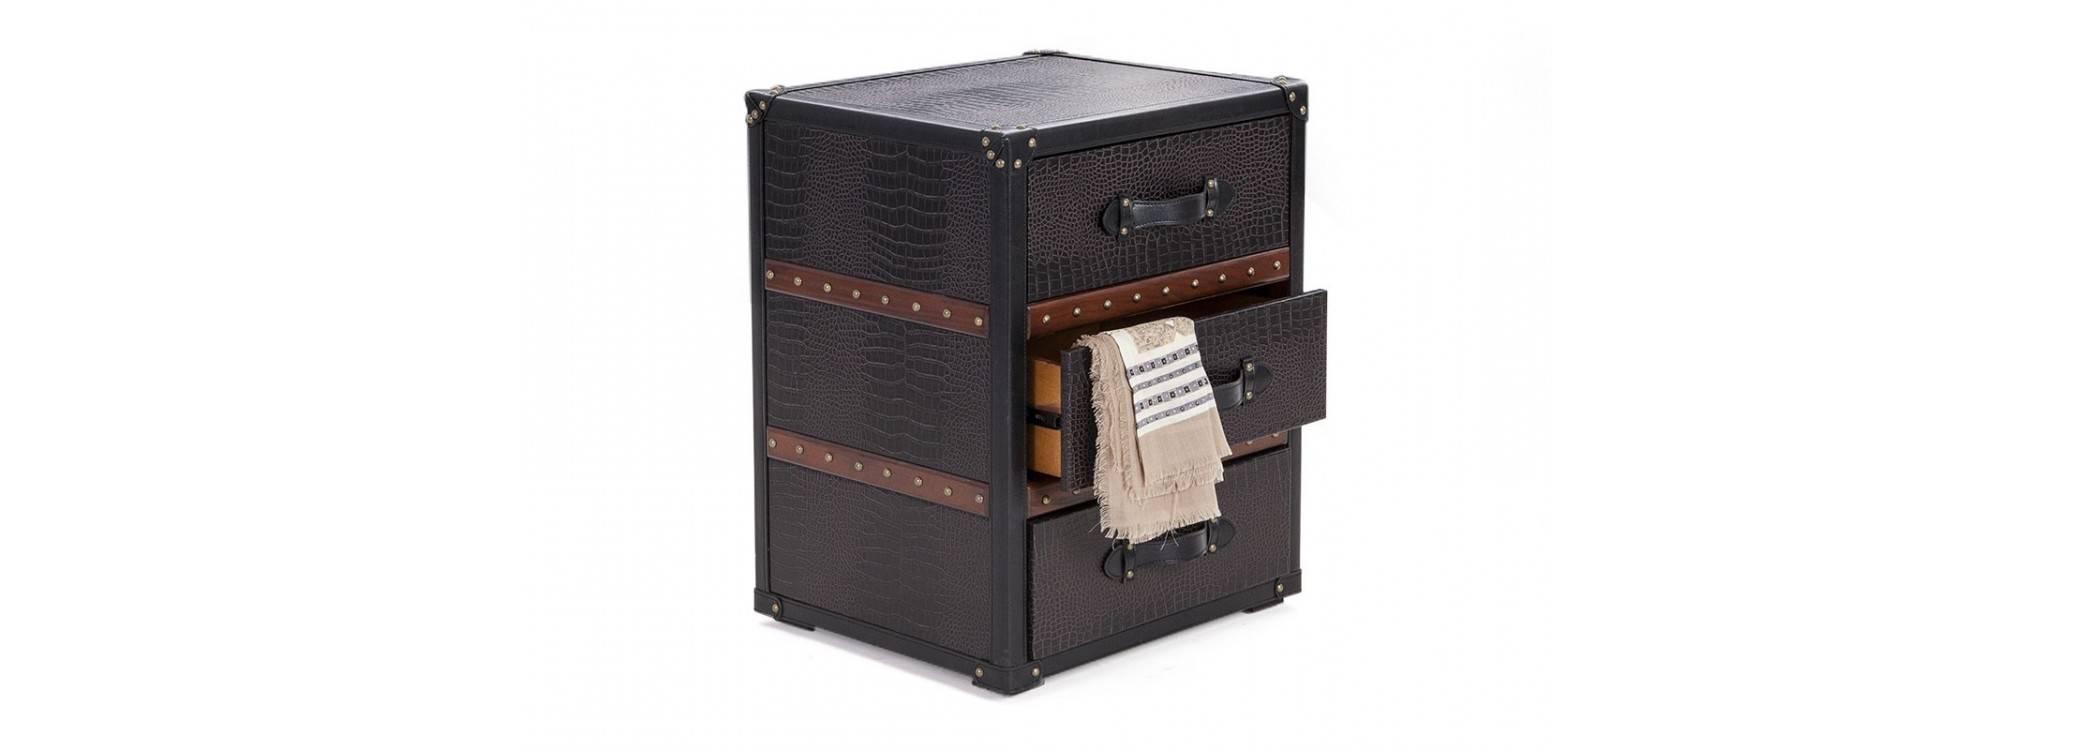 Bout de canapé Cap Horn - 3 tiroirs - Simili cuir croco marron foncé